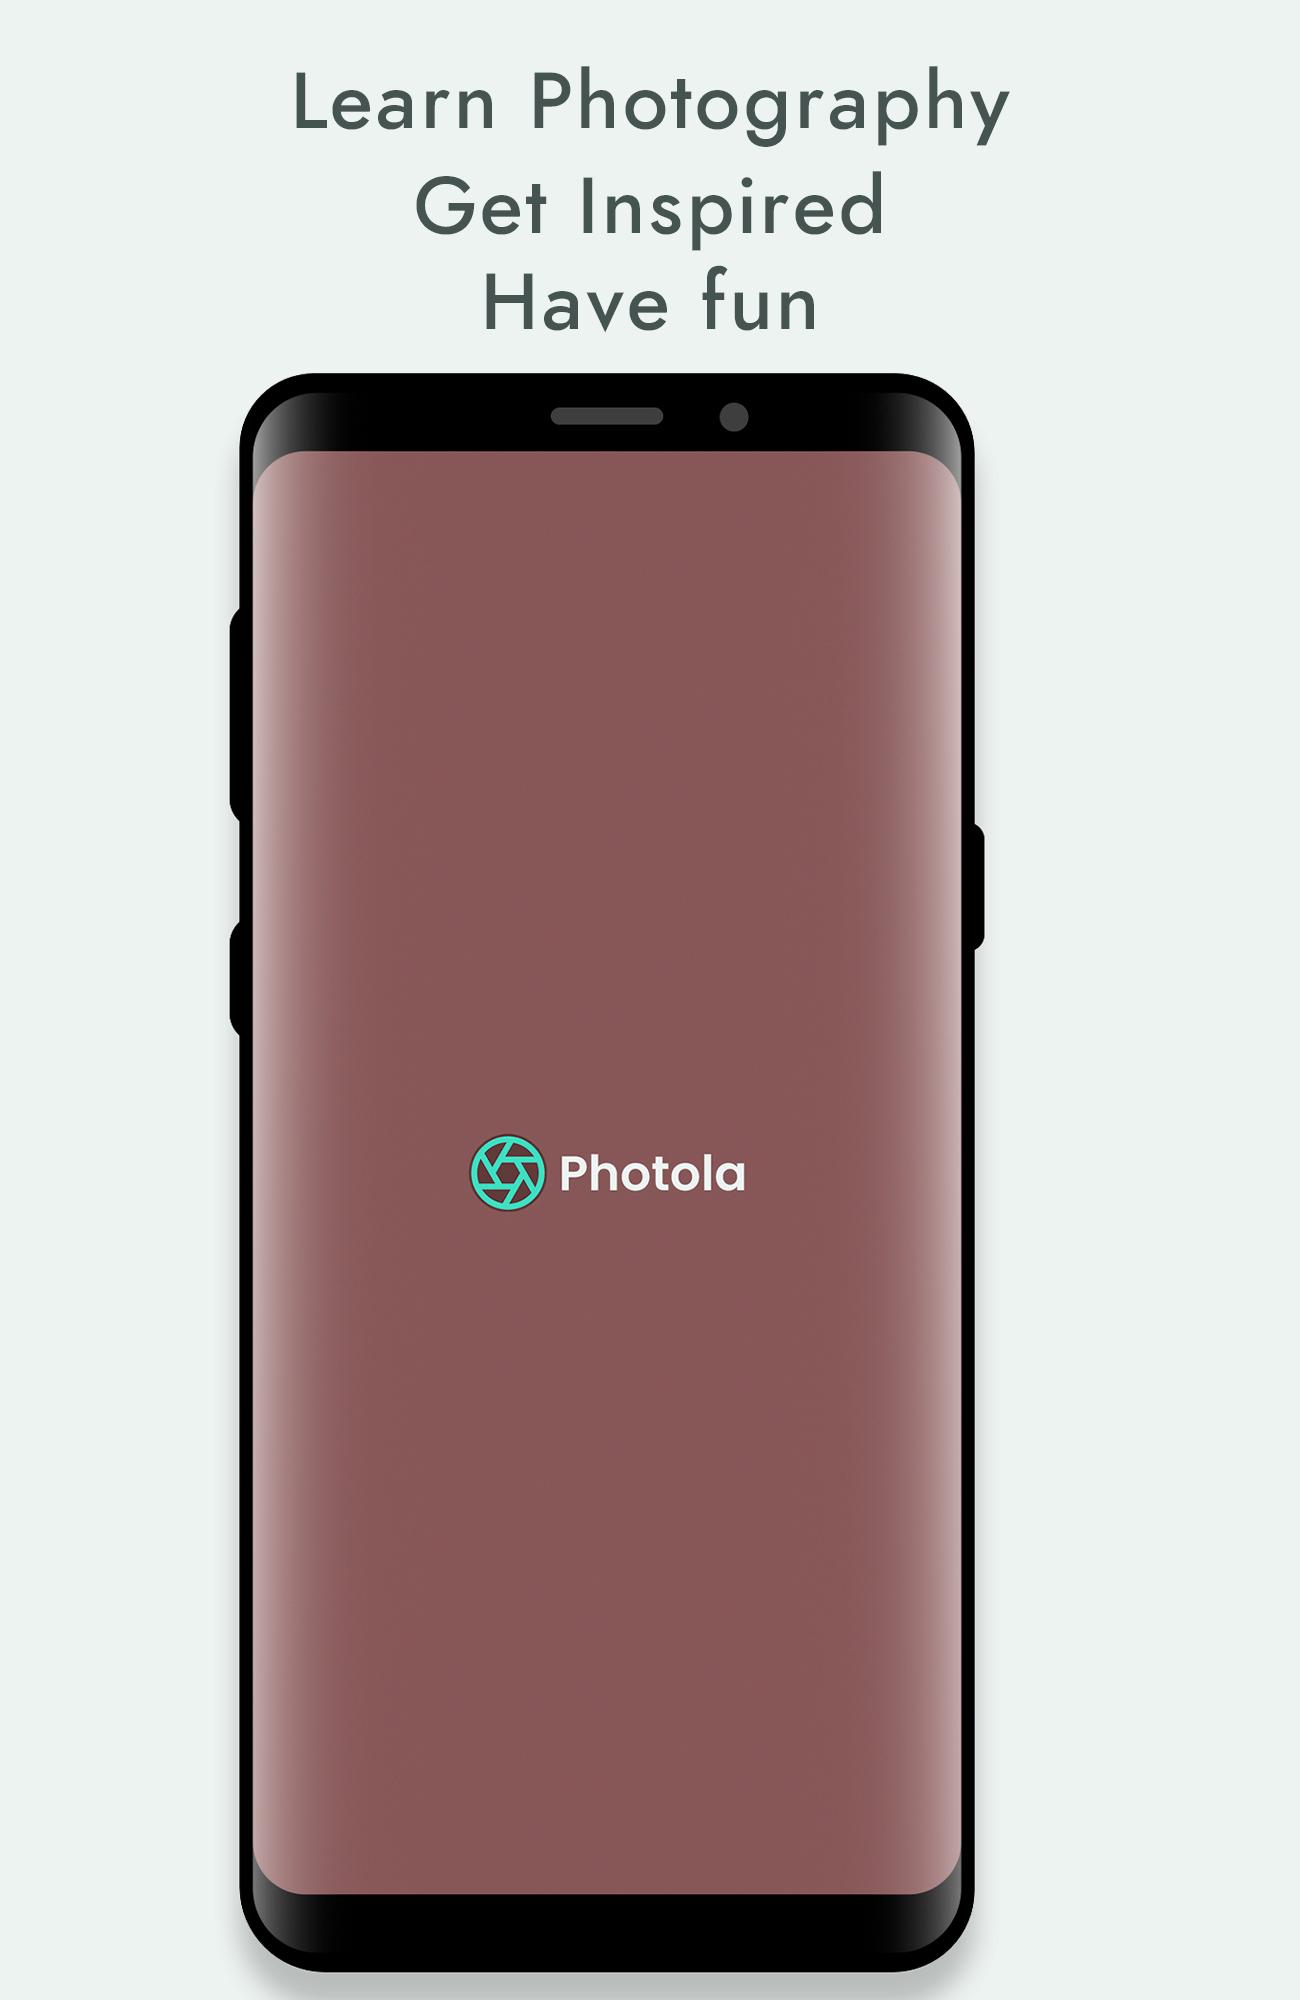 Learn photography, photo editing, tips – Photola